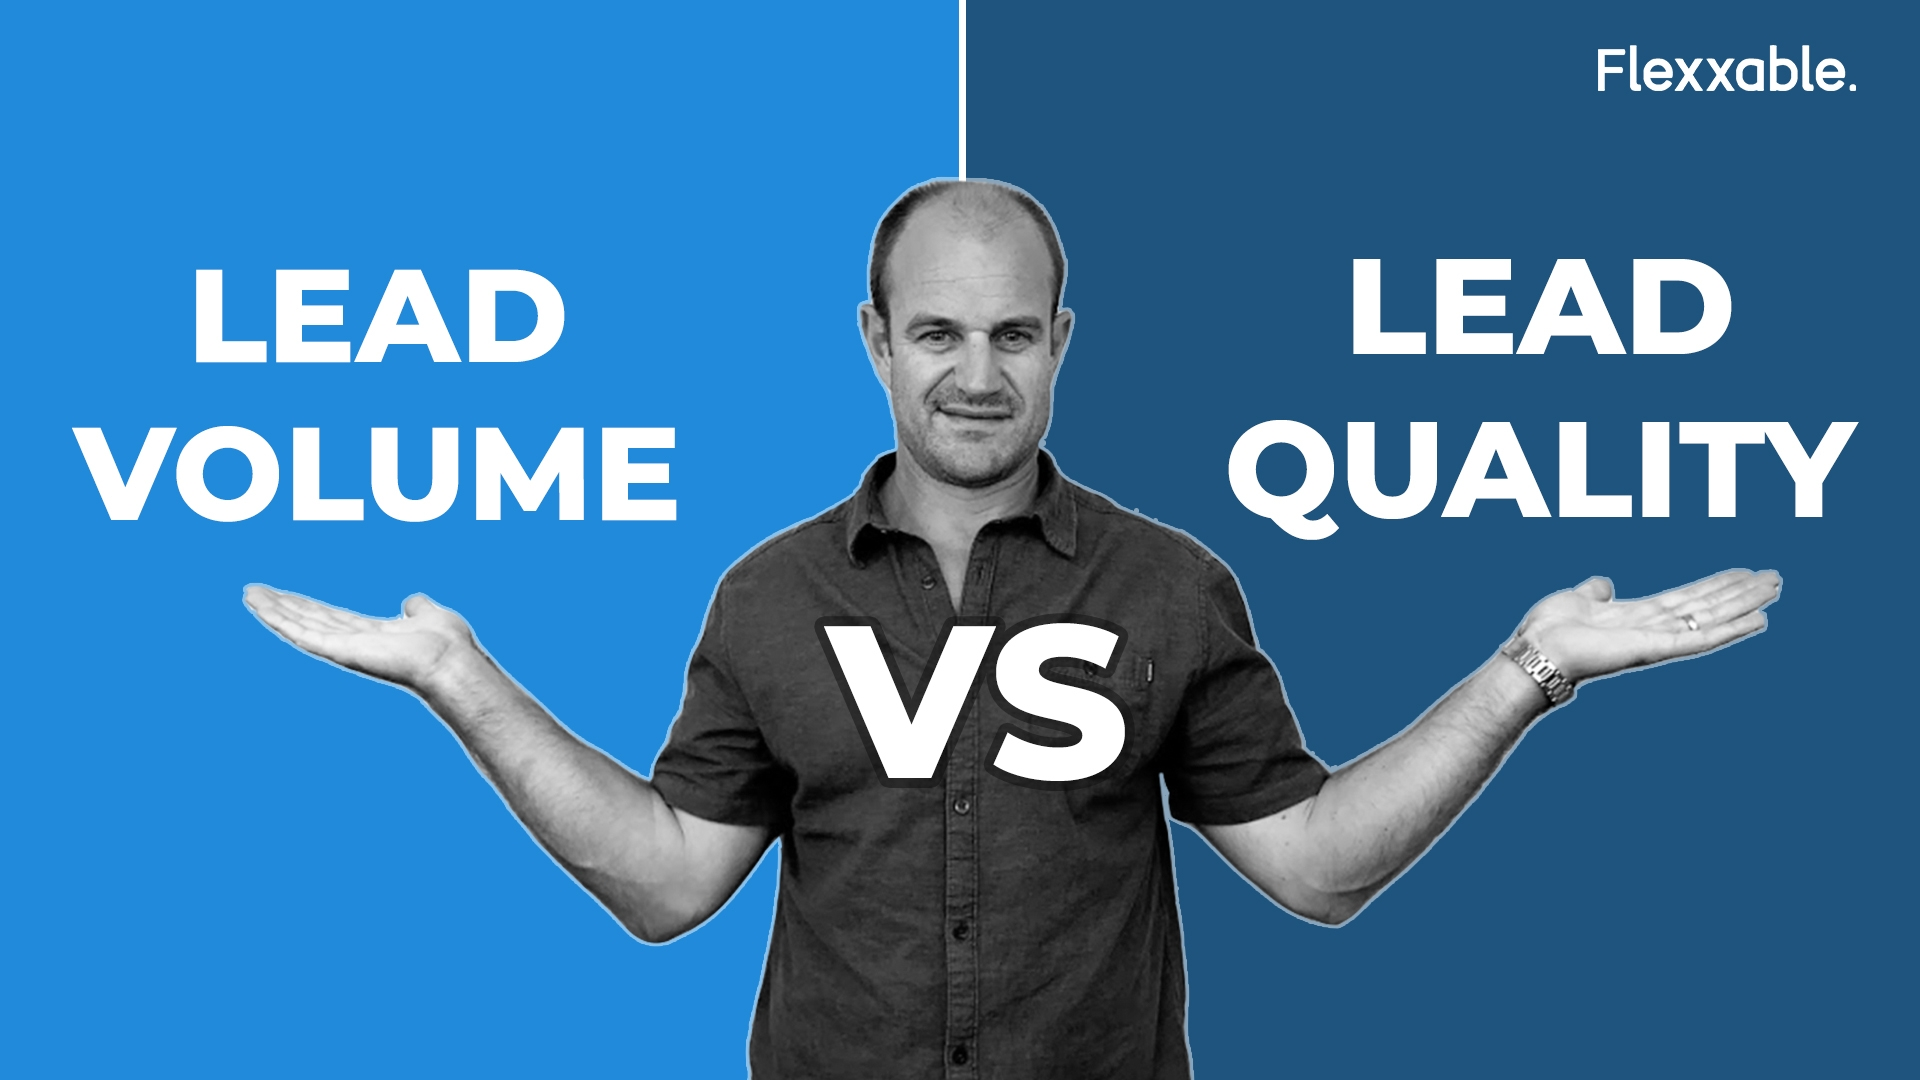 lead volume vs lead quality